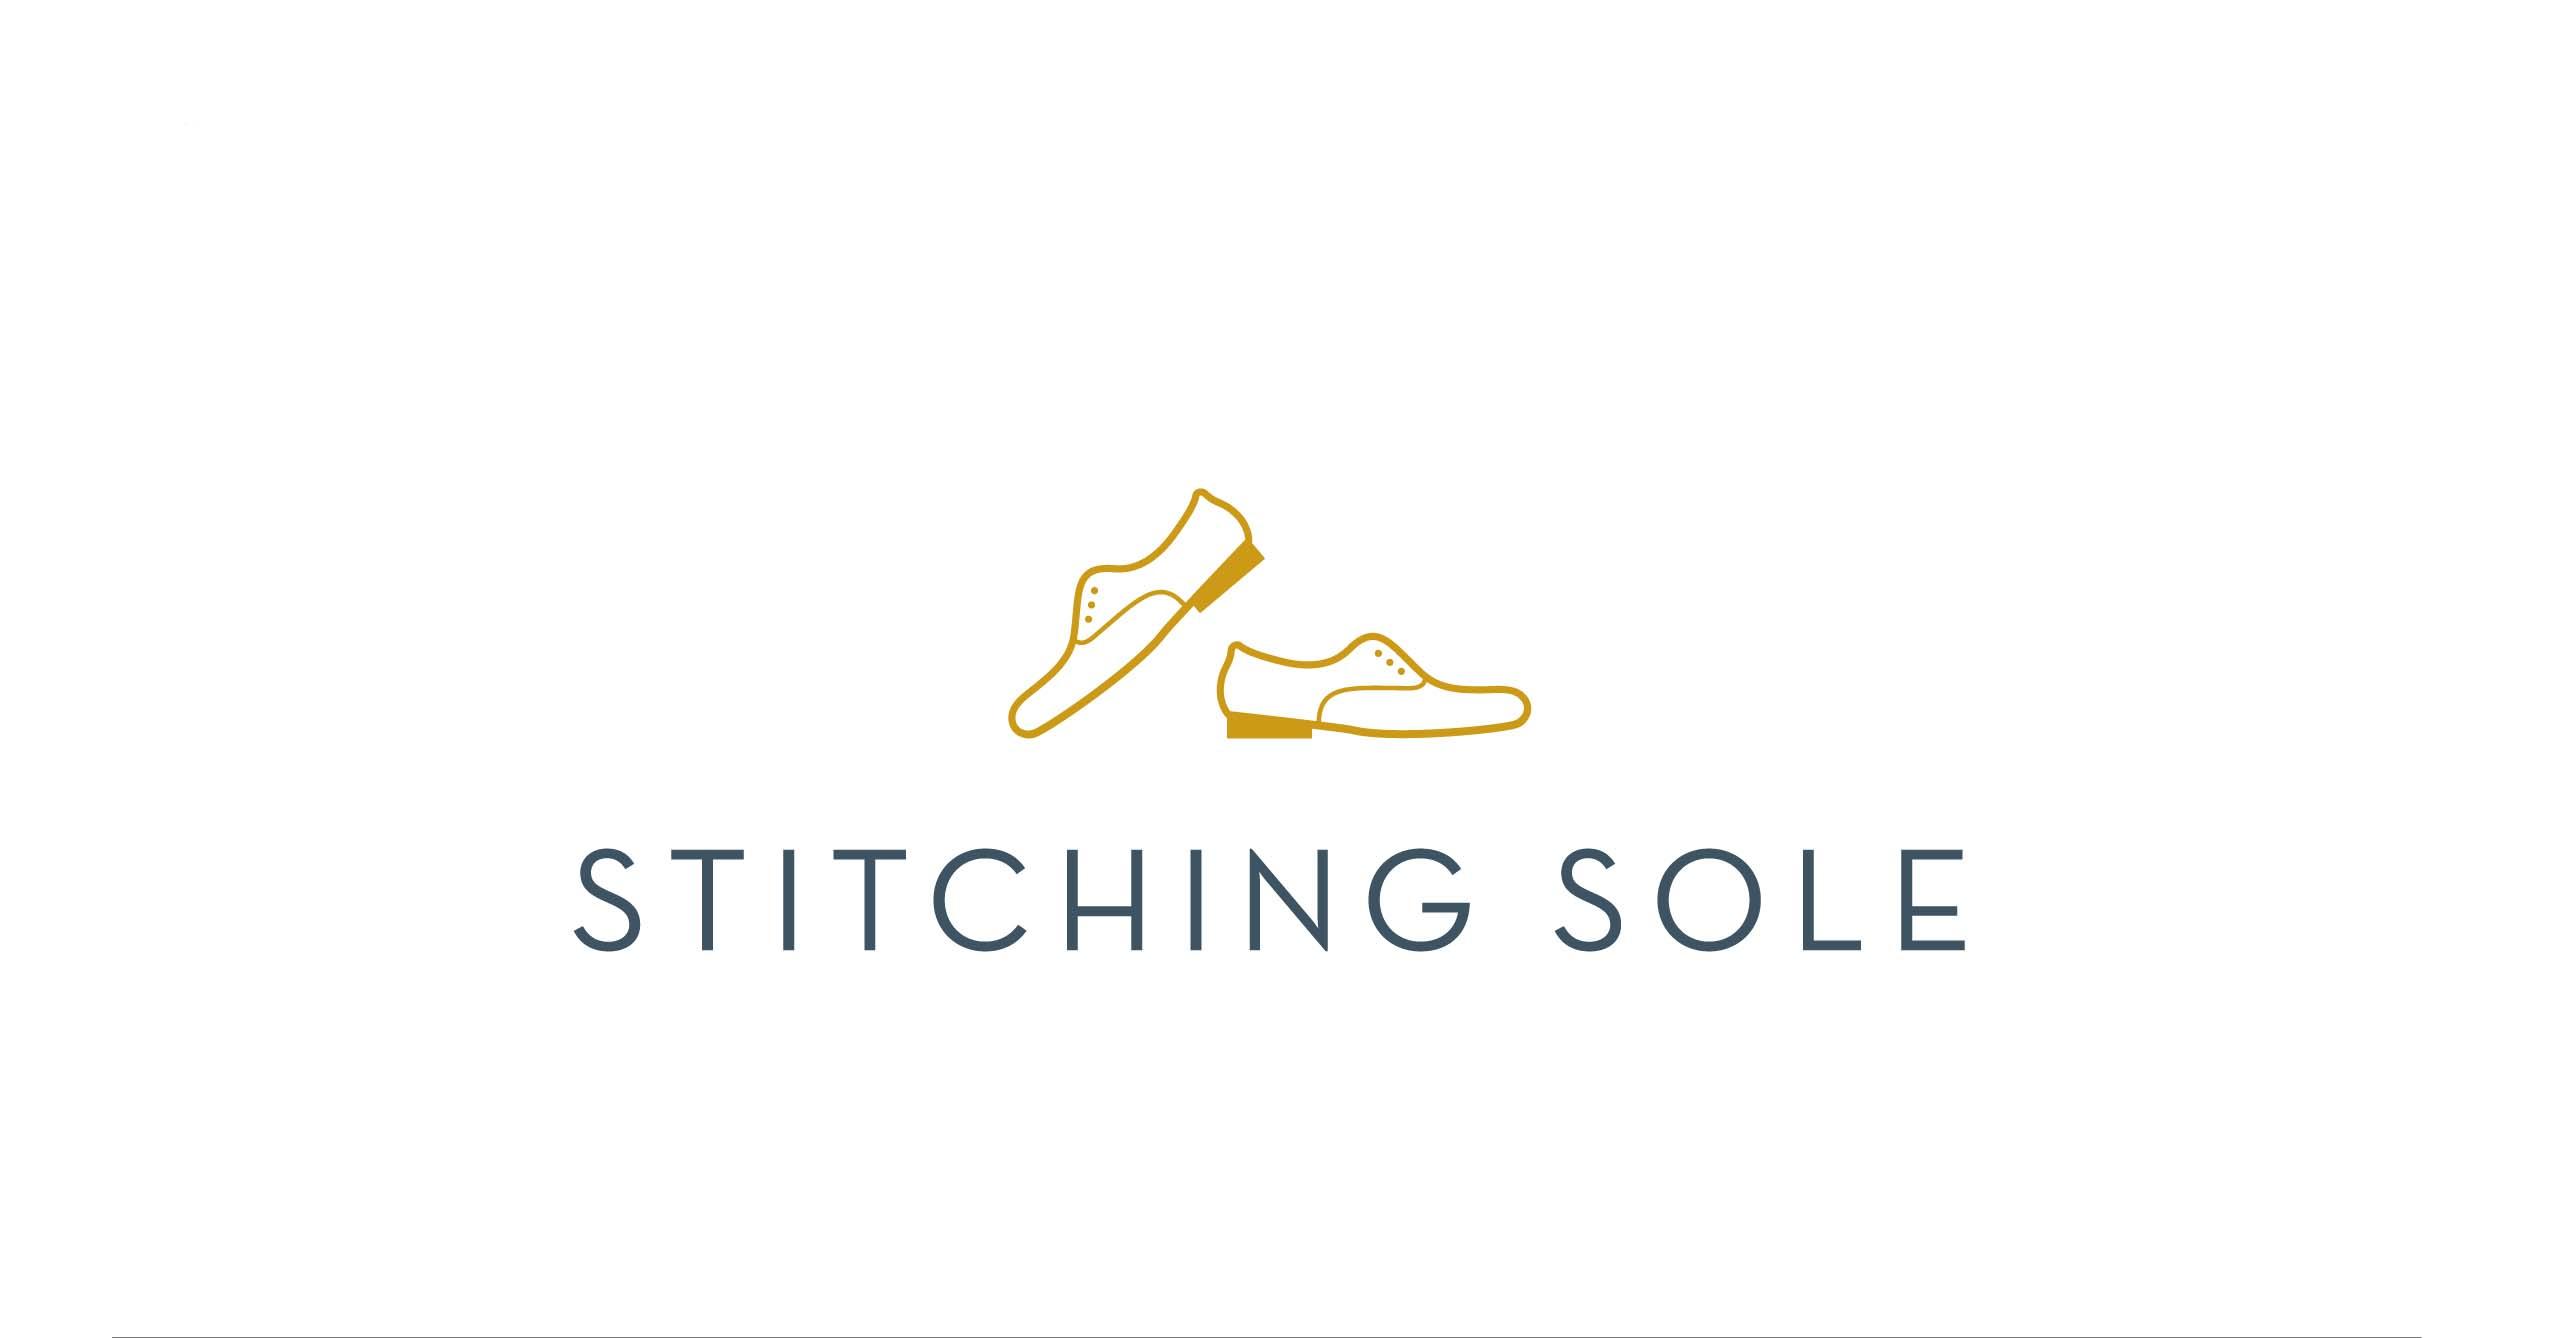 Stitching Sole